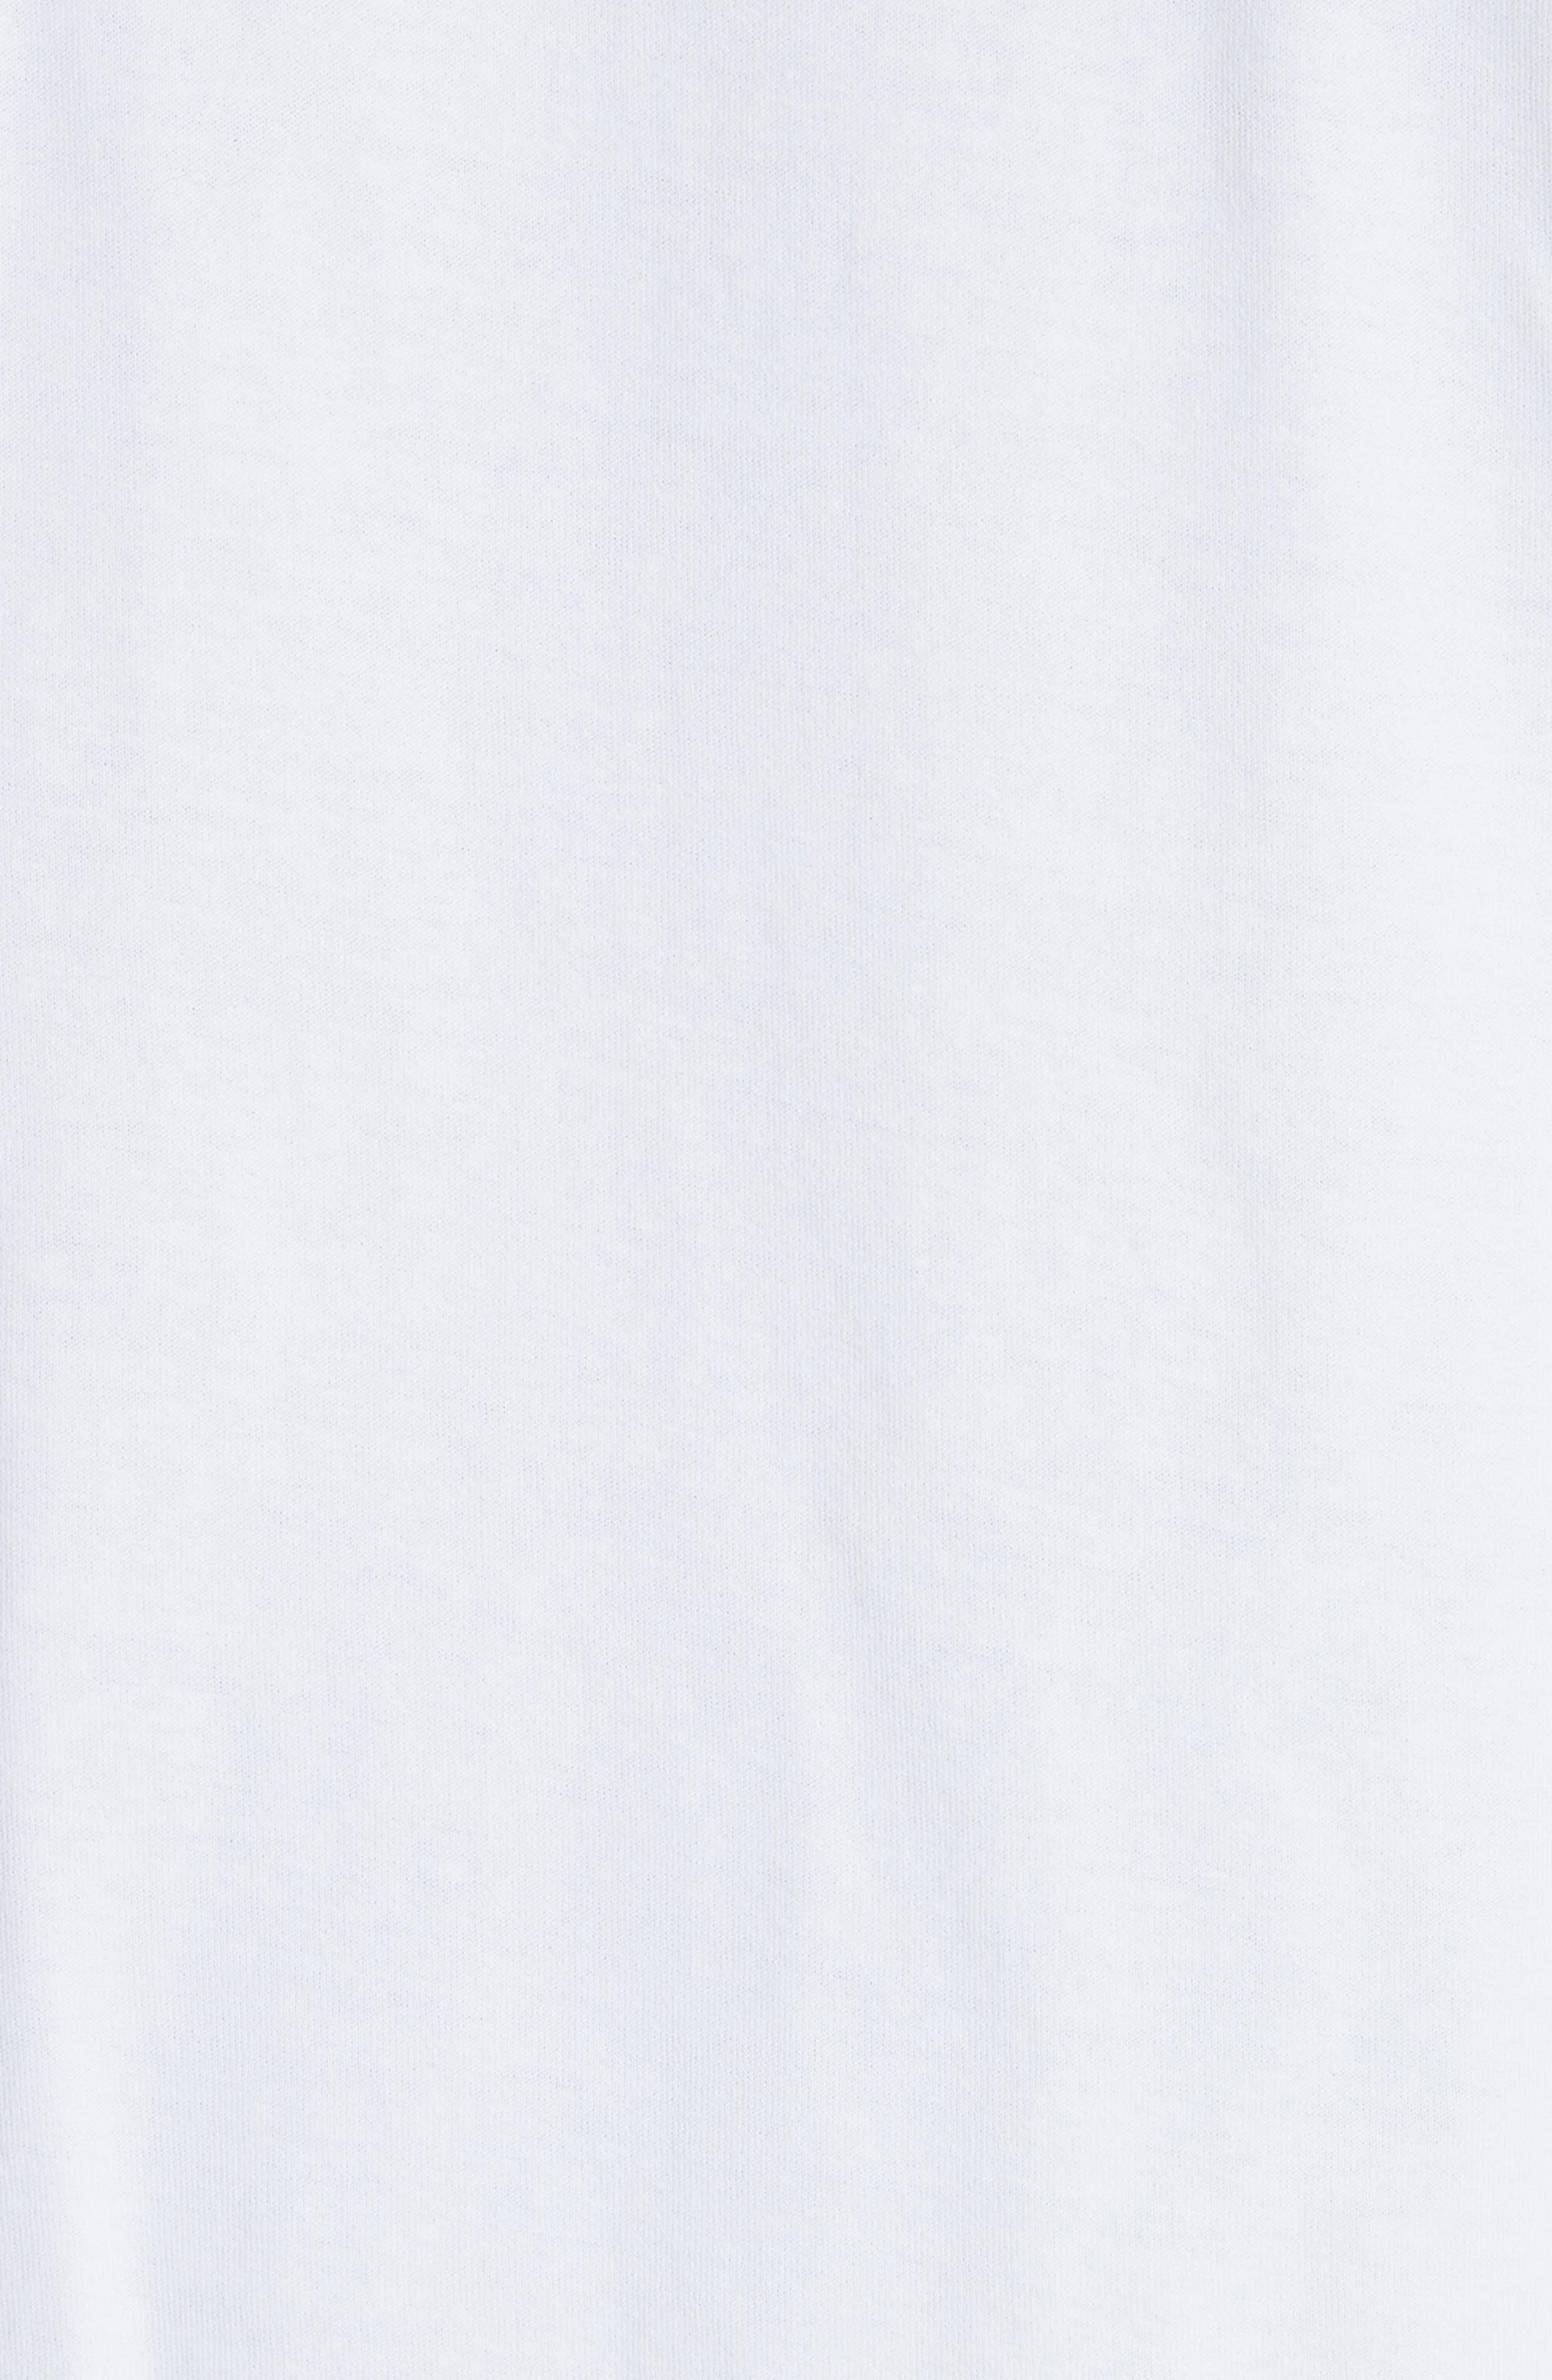 Niave Flower Graphic T-Shirt,                             Alternate thumbnail 5, color,                             100